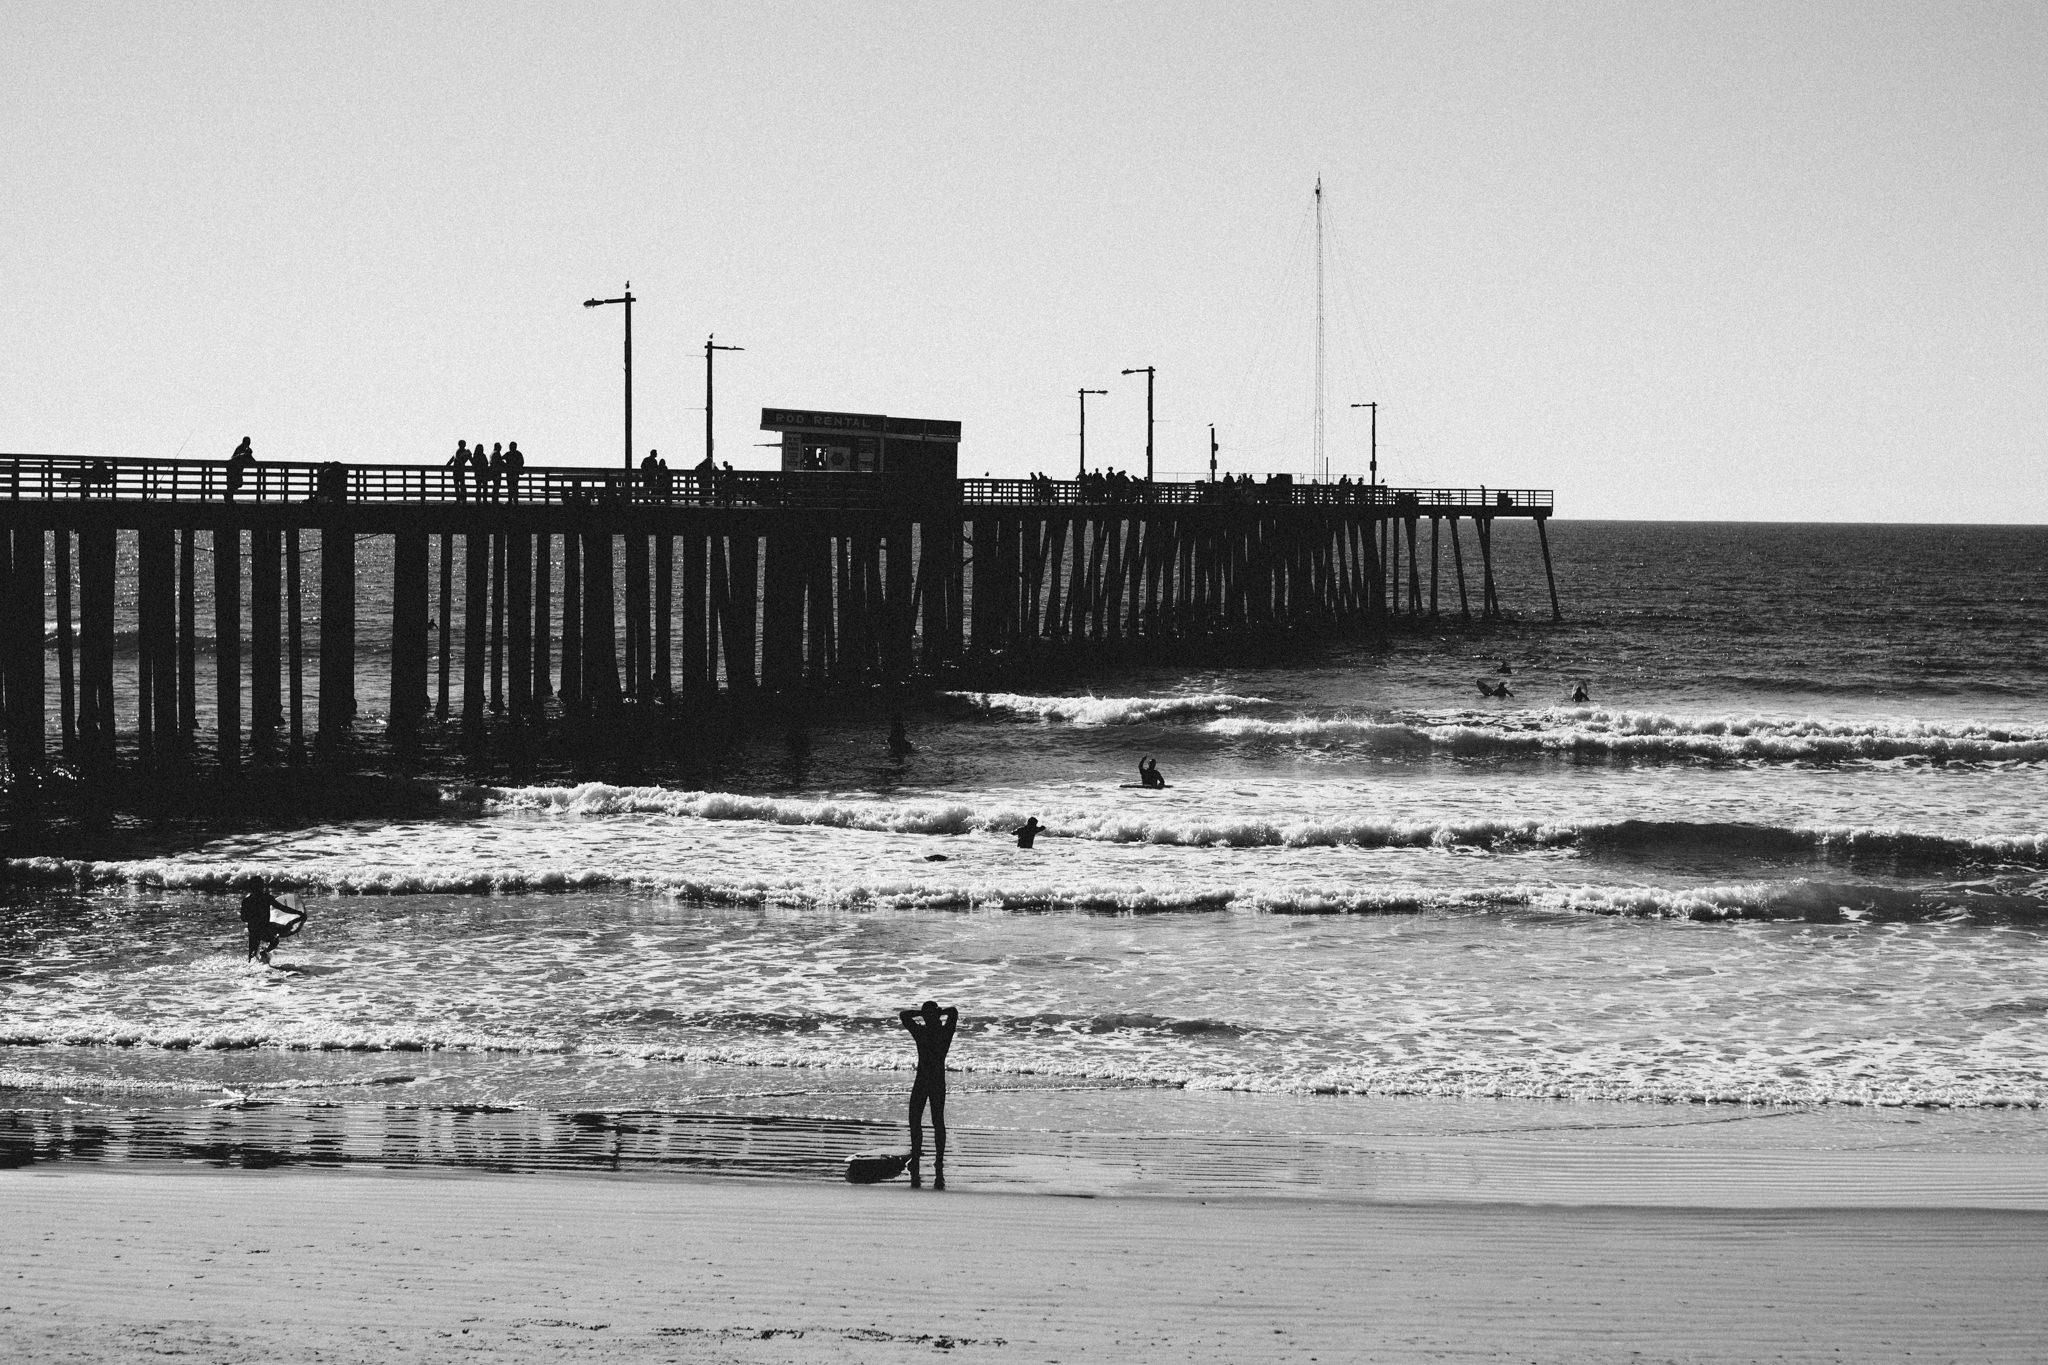 USA Coast to Coast Roadtrip Photos_077.jpg